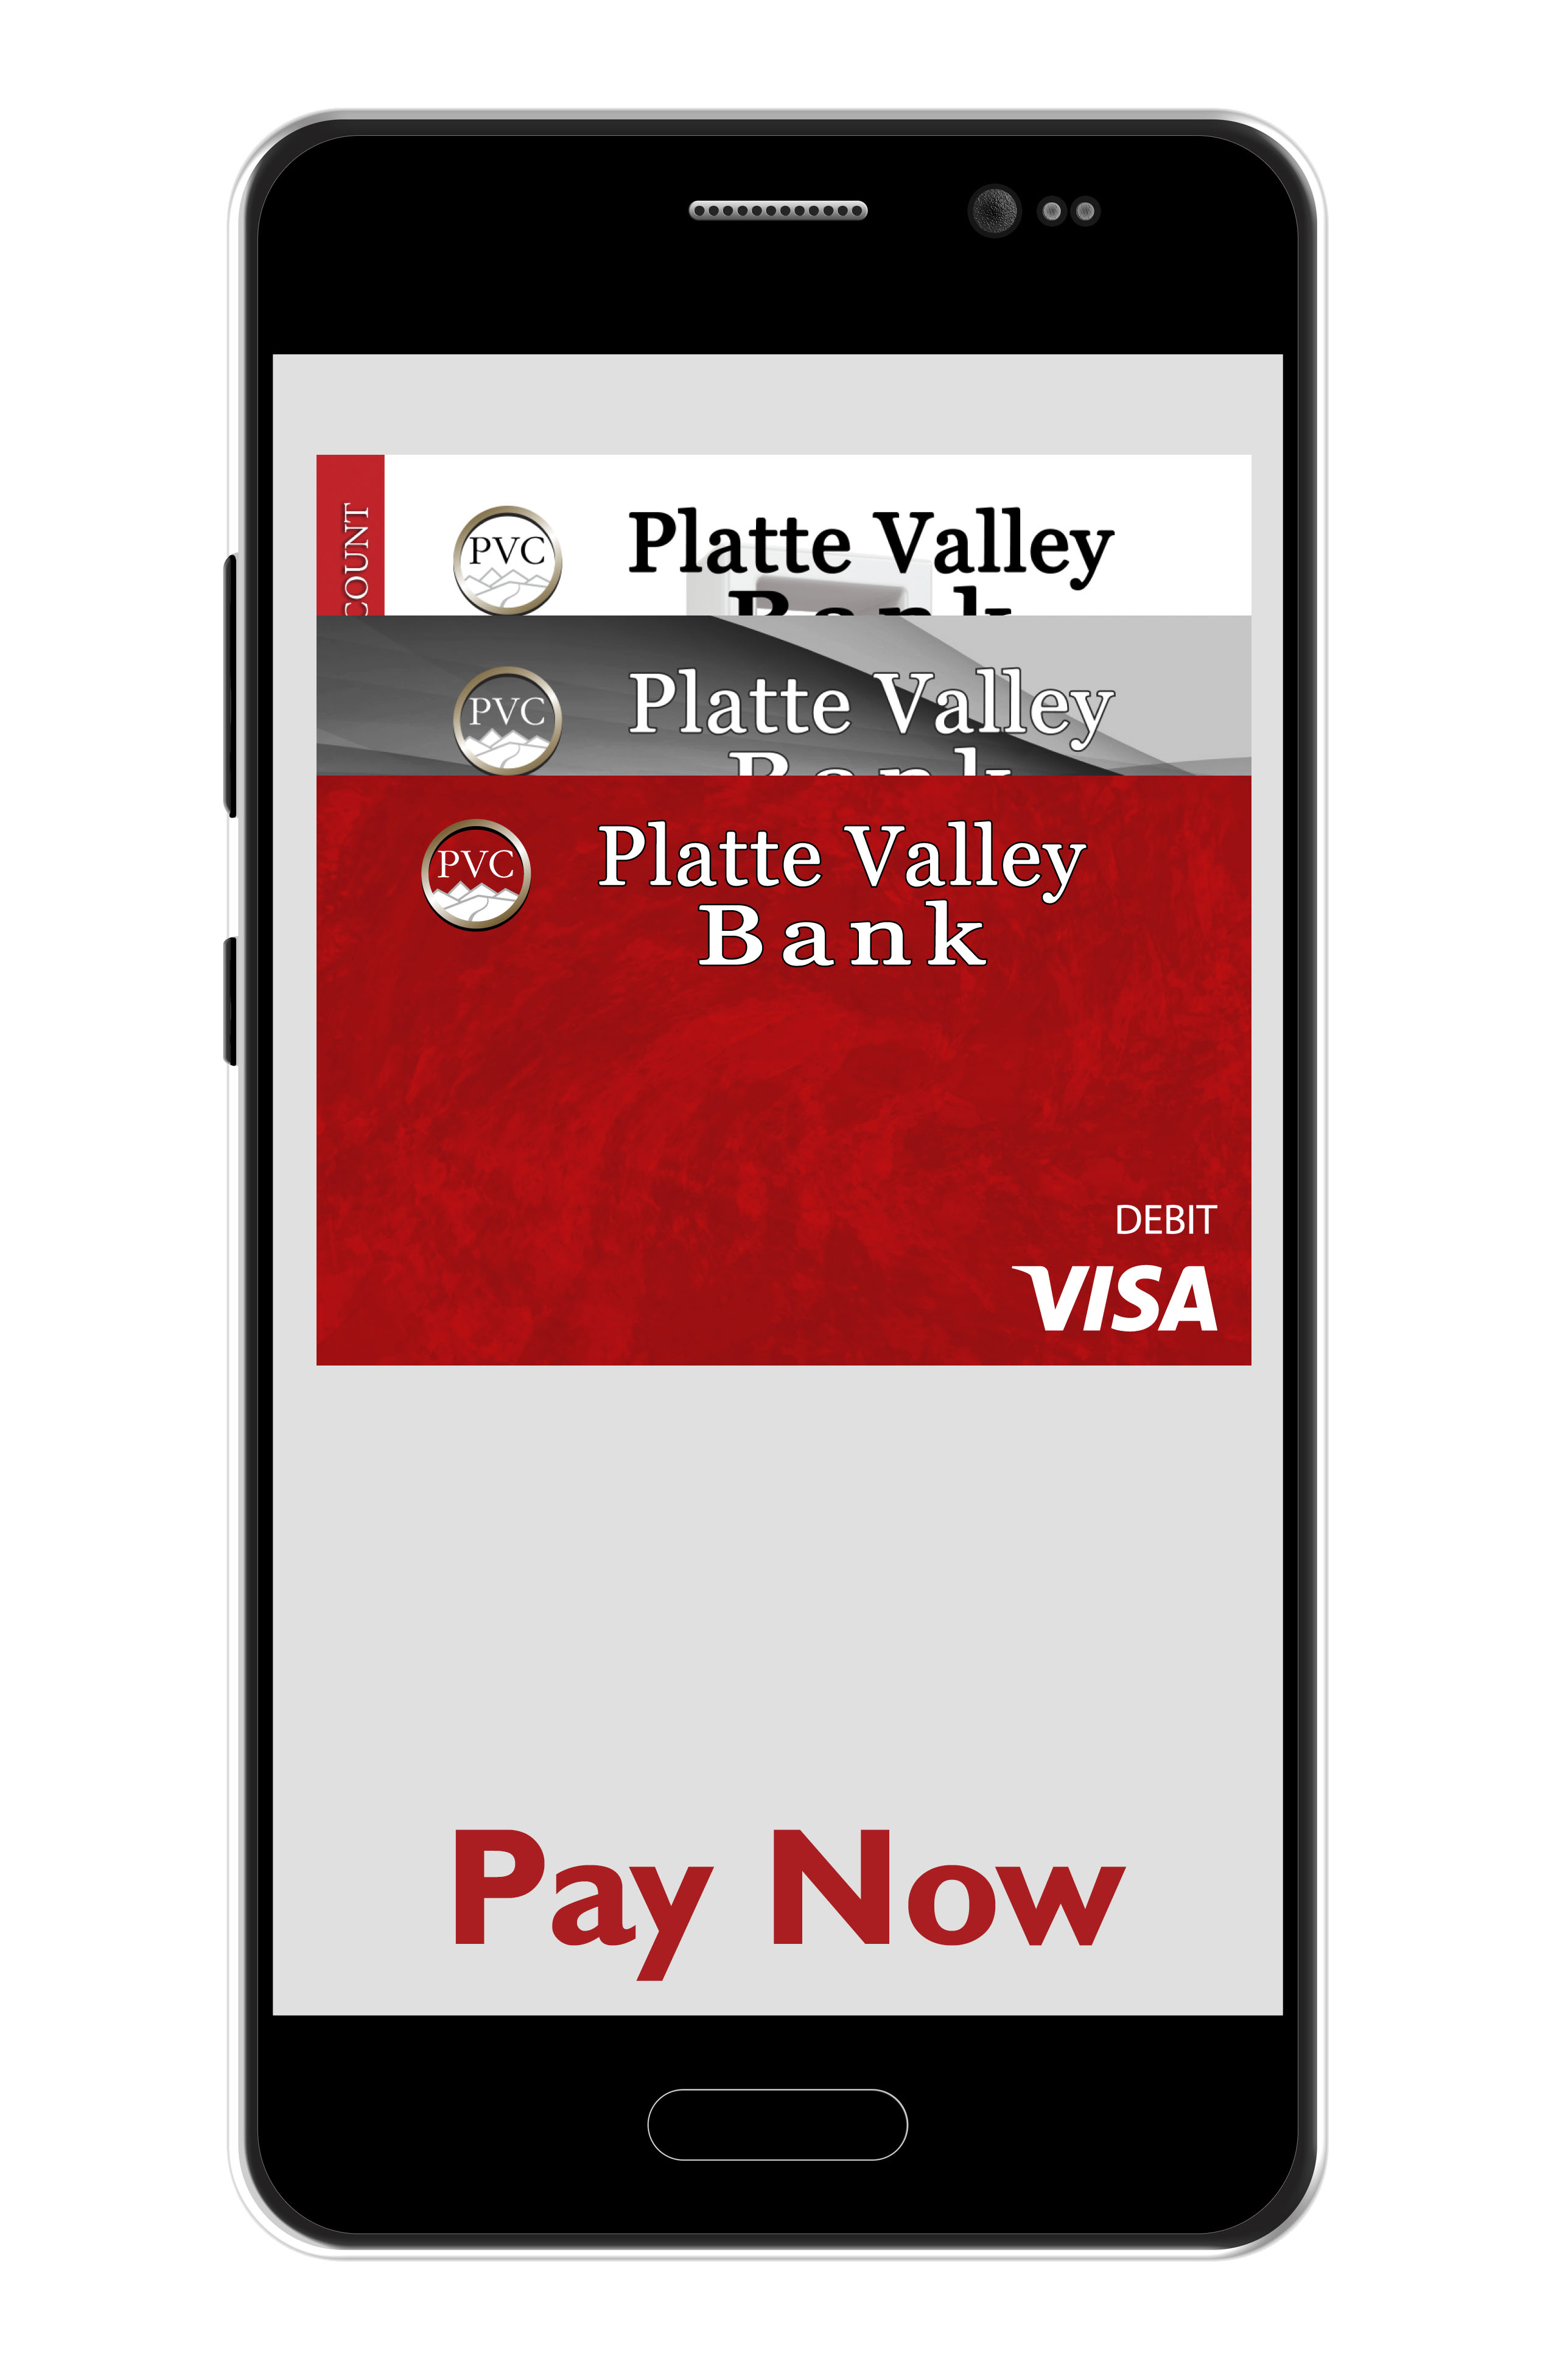 Digital Wallet - Platte Valley Bank